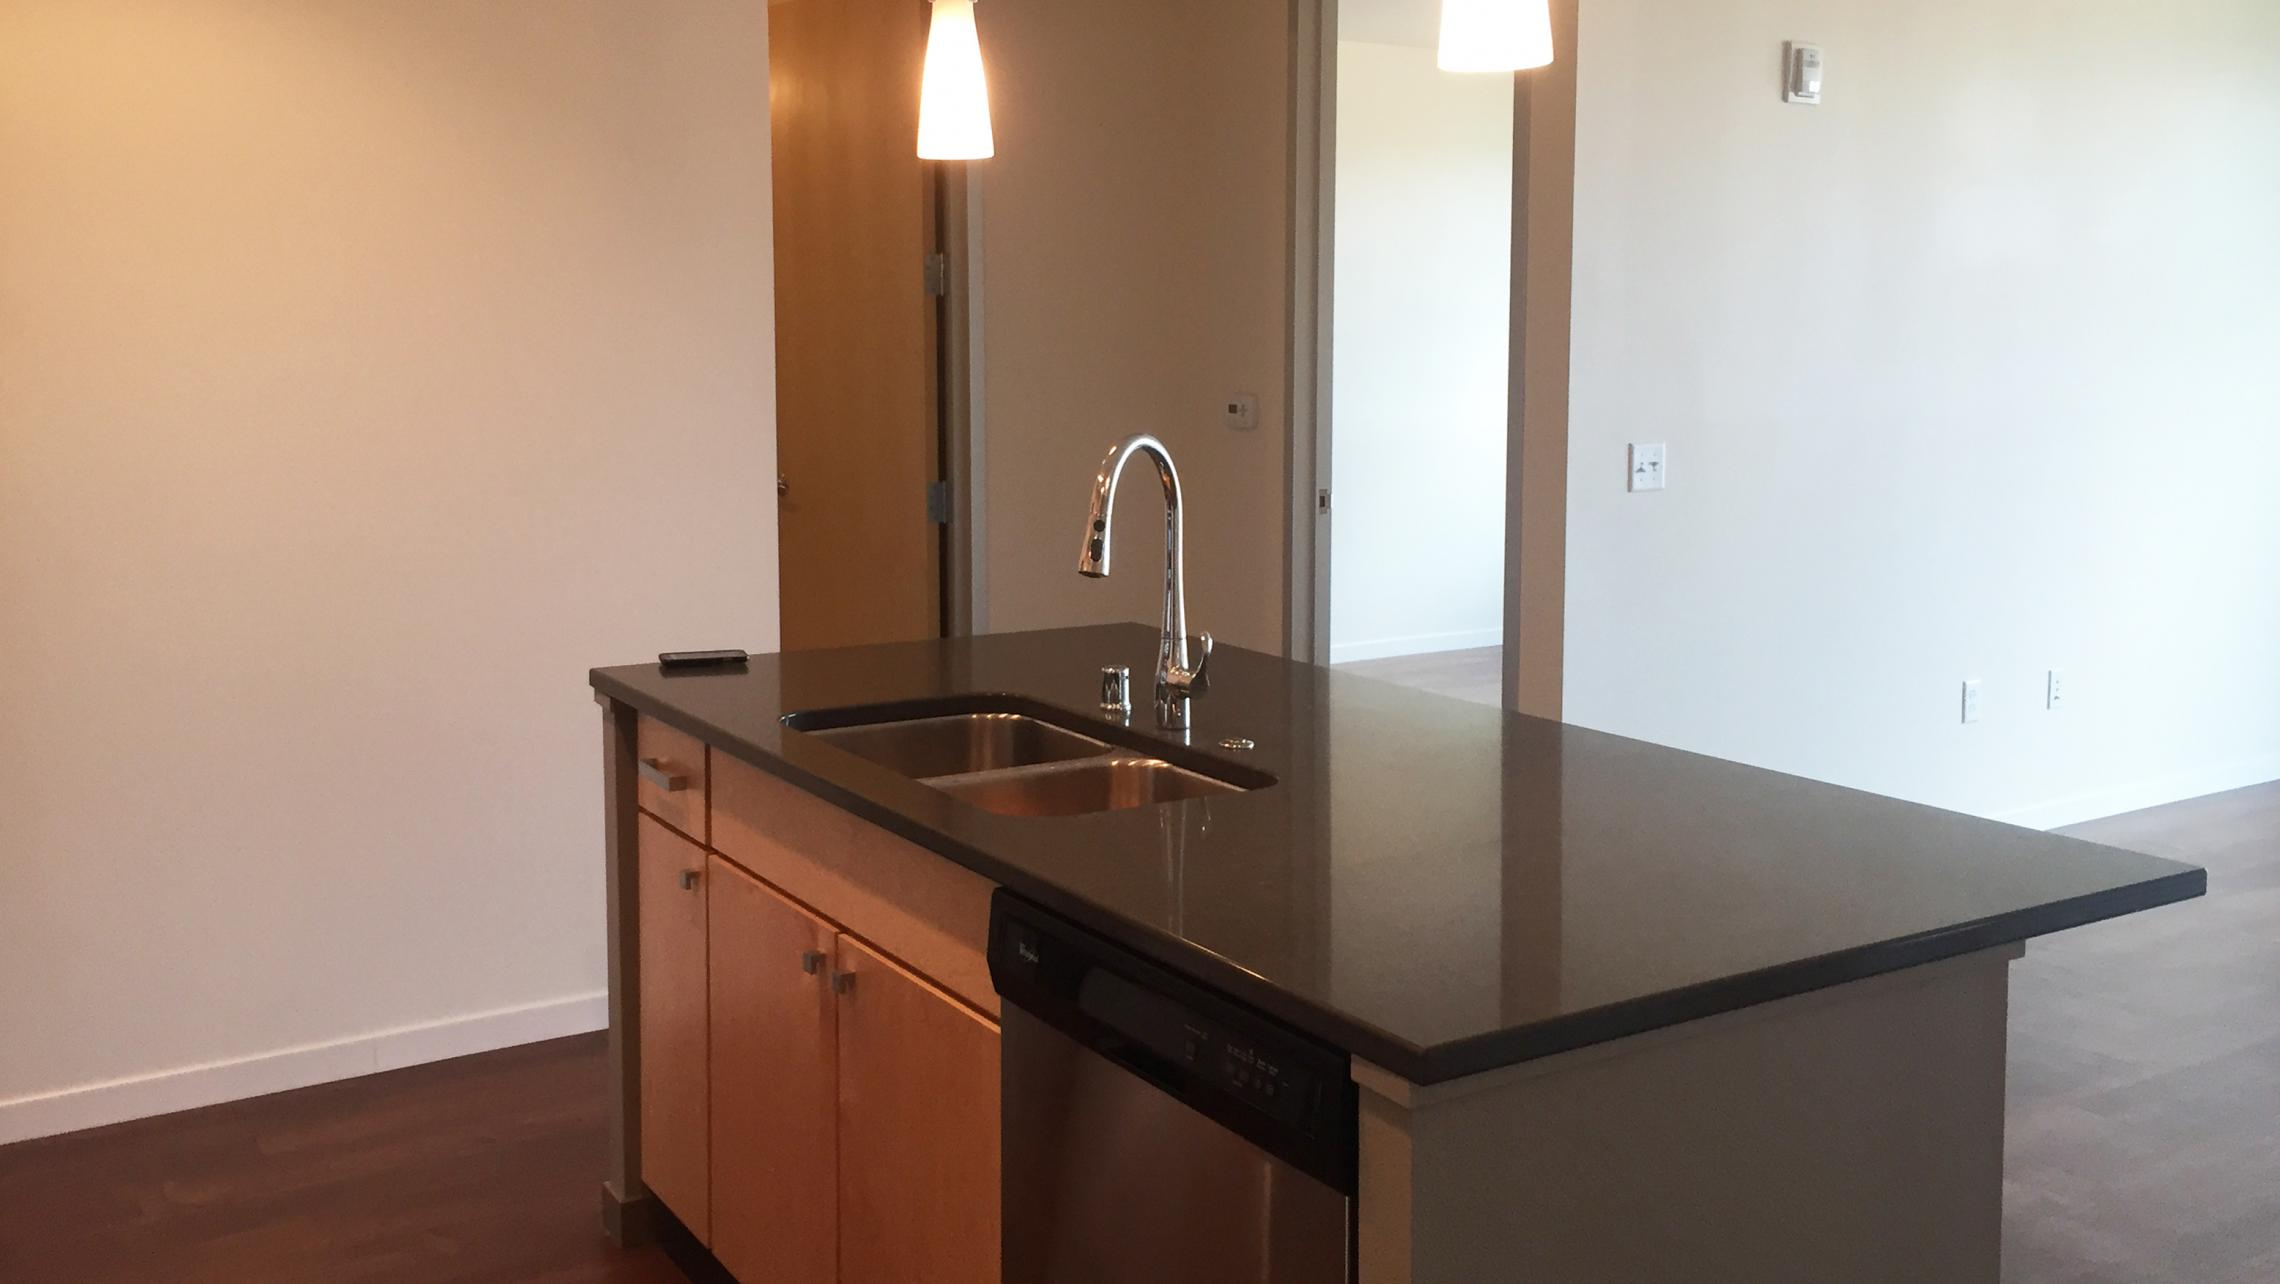 ULI Nine Line Apartment 518 - Kitchen Island